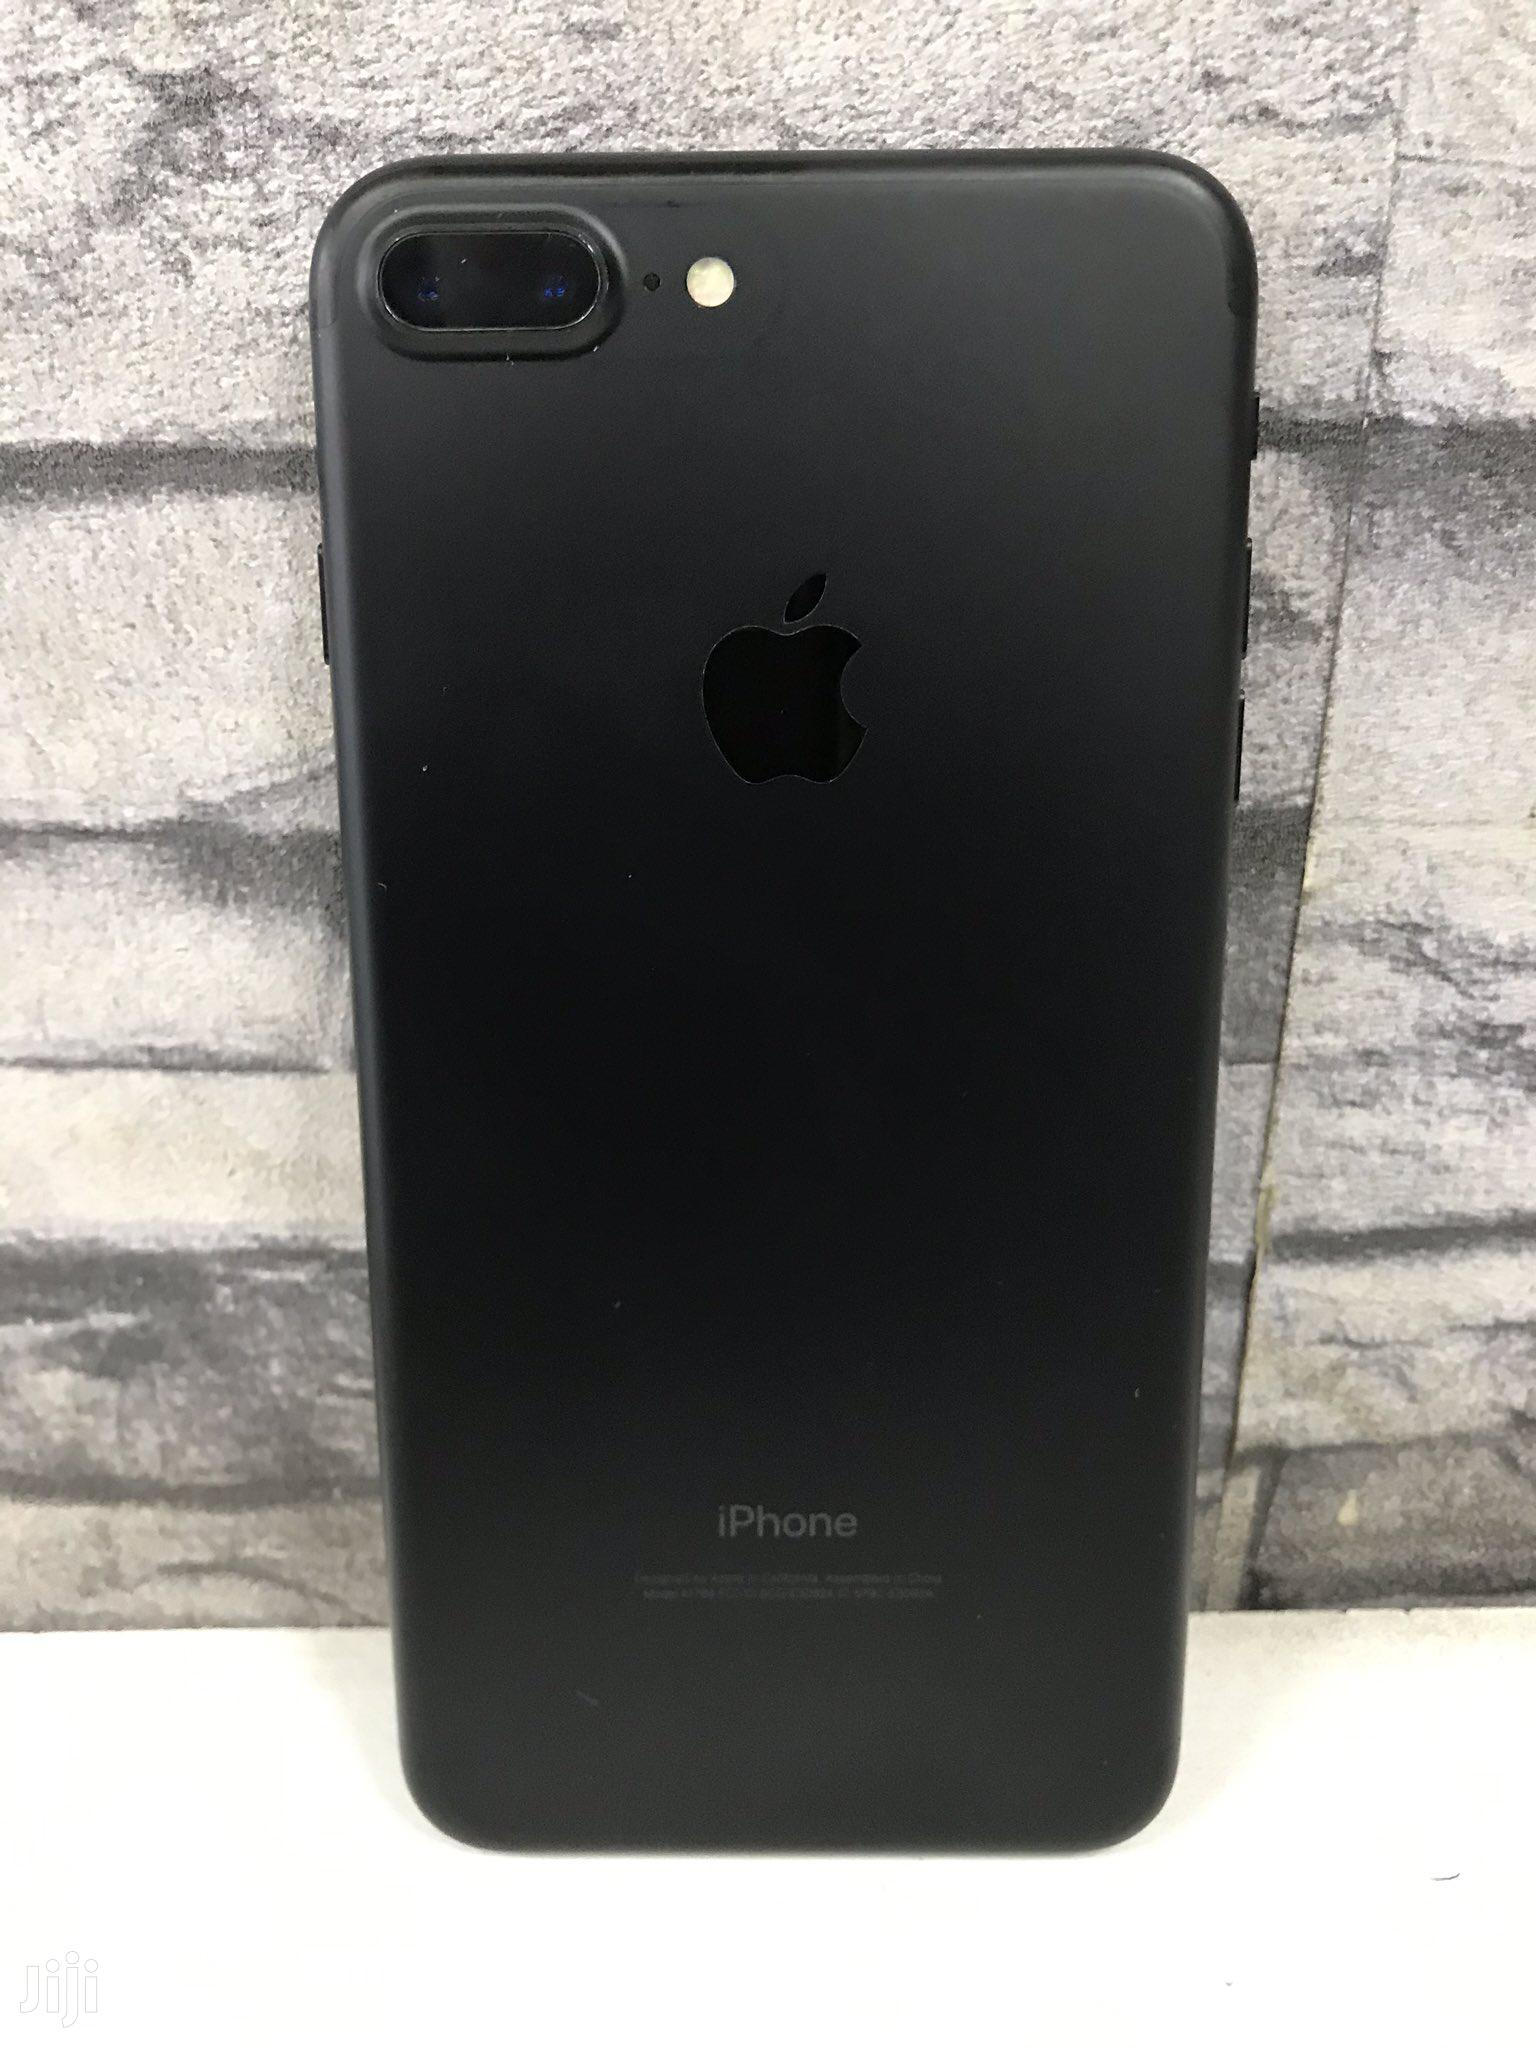 Apple iPhone 7 Plus 32 GB Black | Mobile Phones for sale in Kokomlemle, Greater Accra, Ghana